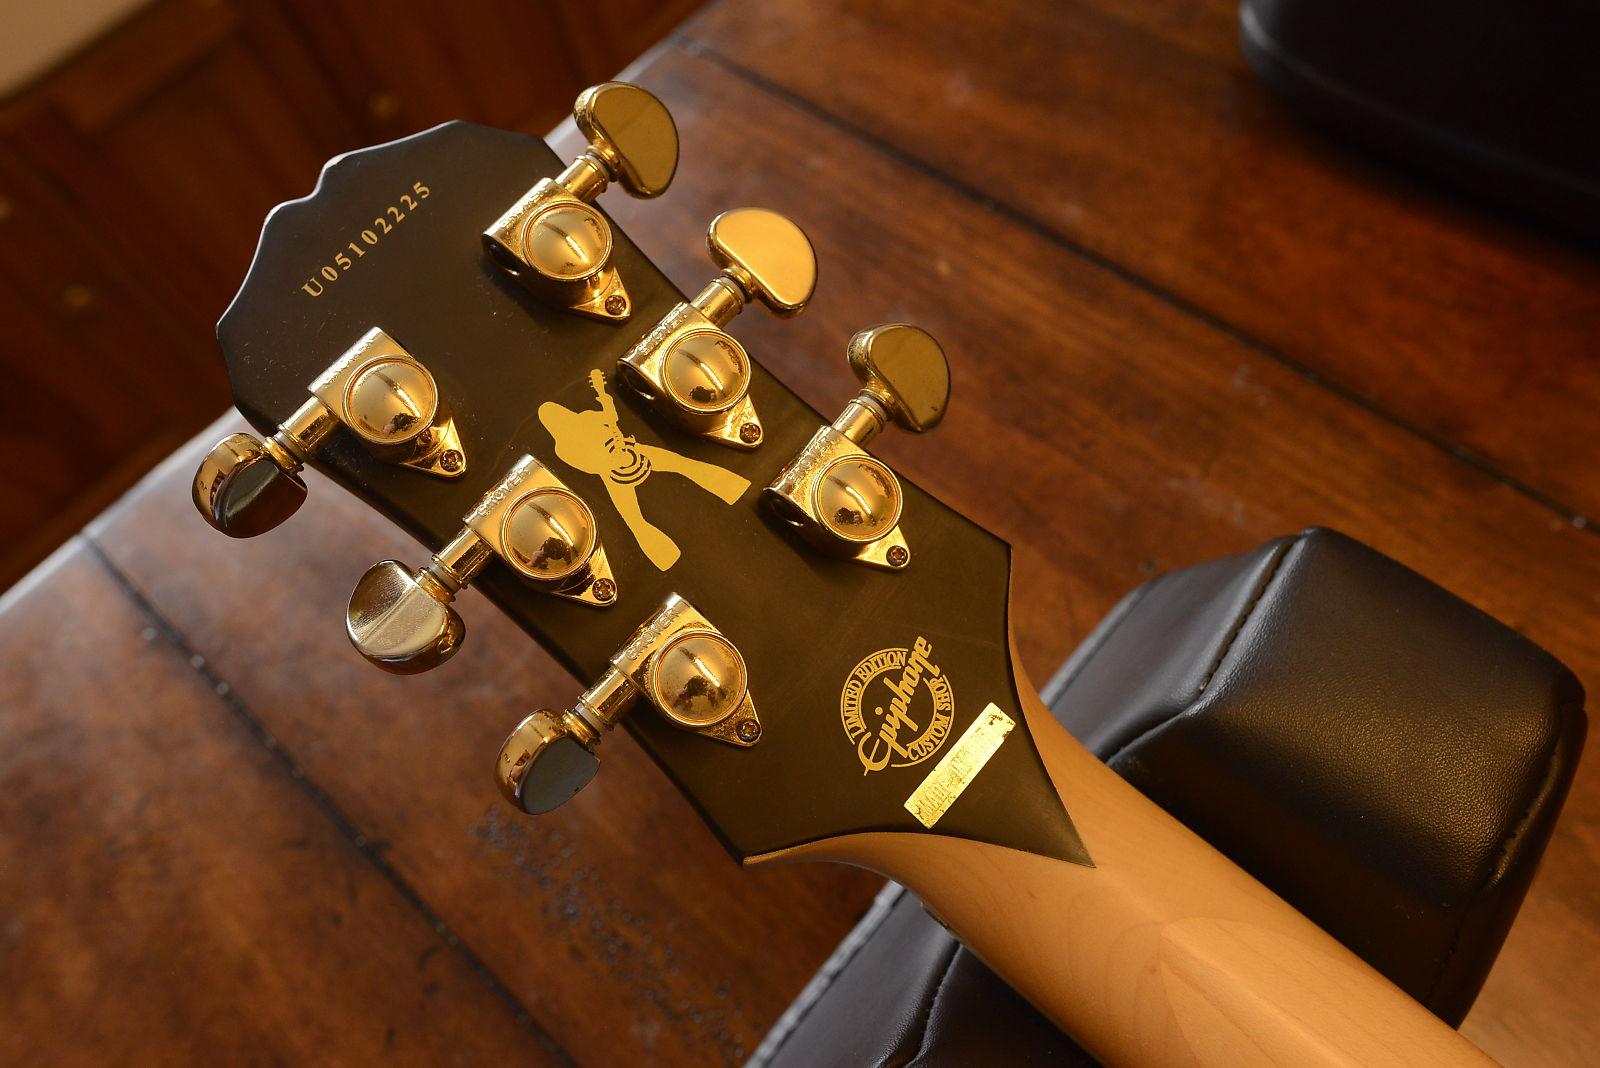 Epiphone Custom Shop Zakk Wylde Signature Gibson Les Paul Camo Bullseye  EMG's and Case! Korea model!